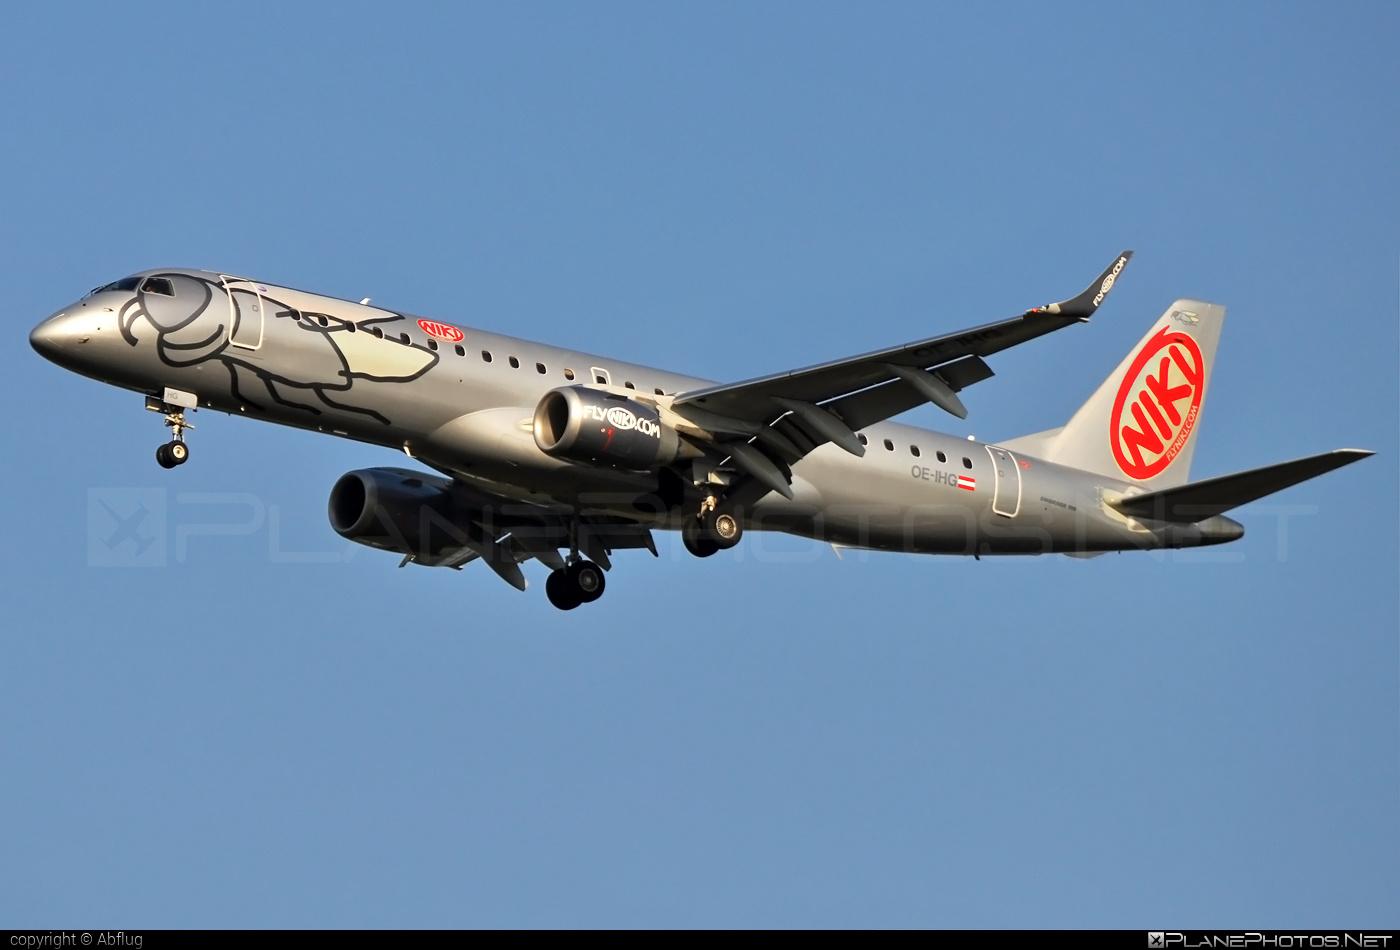 Embraer E190LR (ERJ-190-100LR) - OE-IHG operated by Niki #e190 #e190100 #e190100lr #e190lr #embraer #embraer190 #embraer190100lr #embraer190lr #flyniki #niki